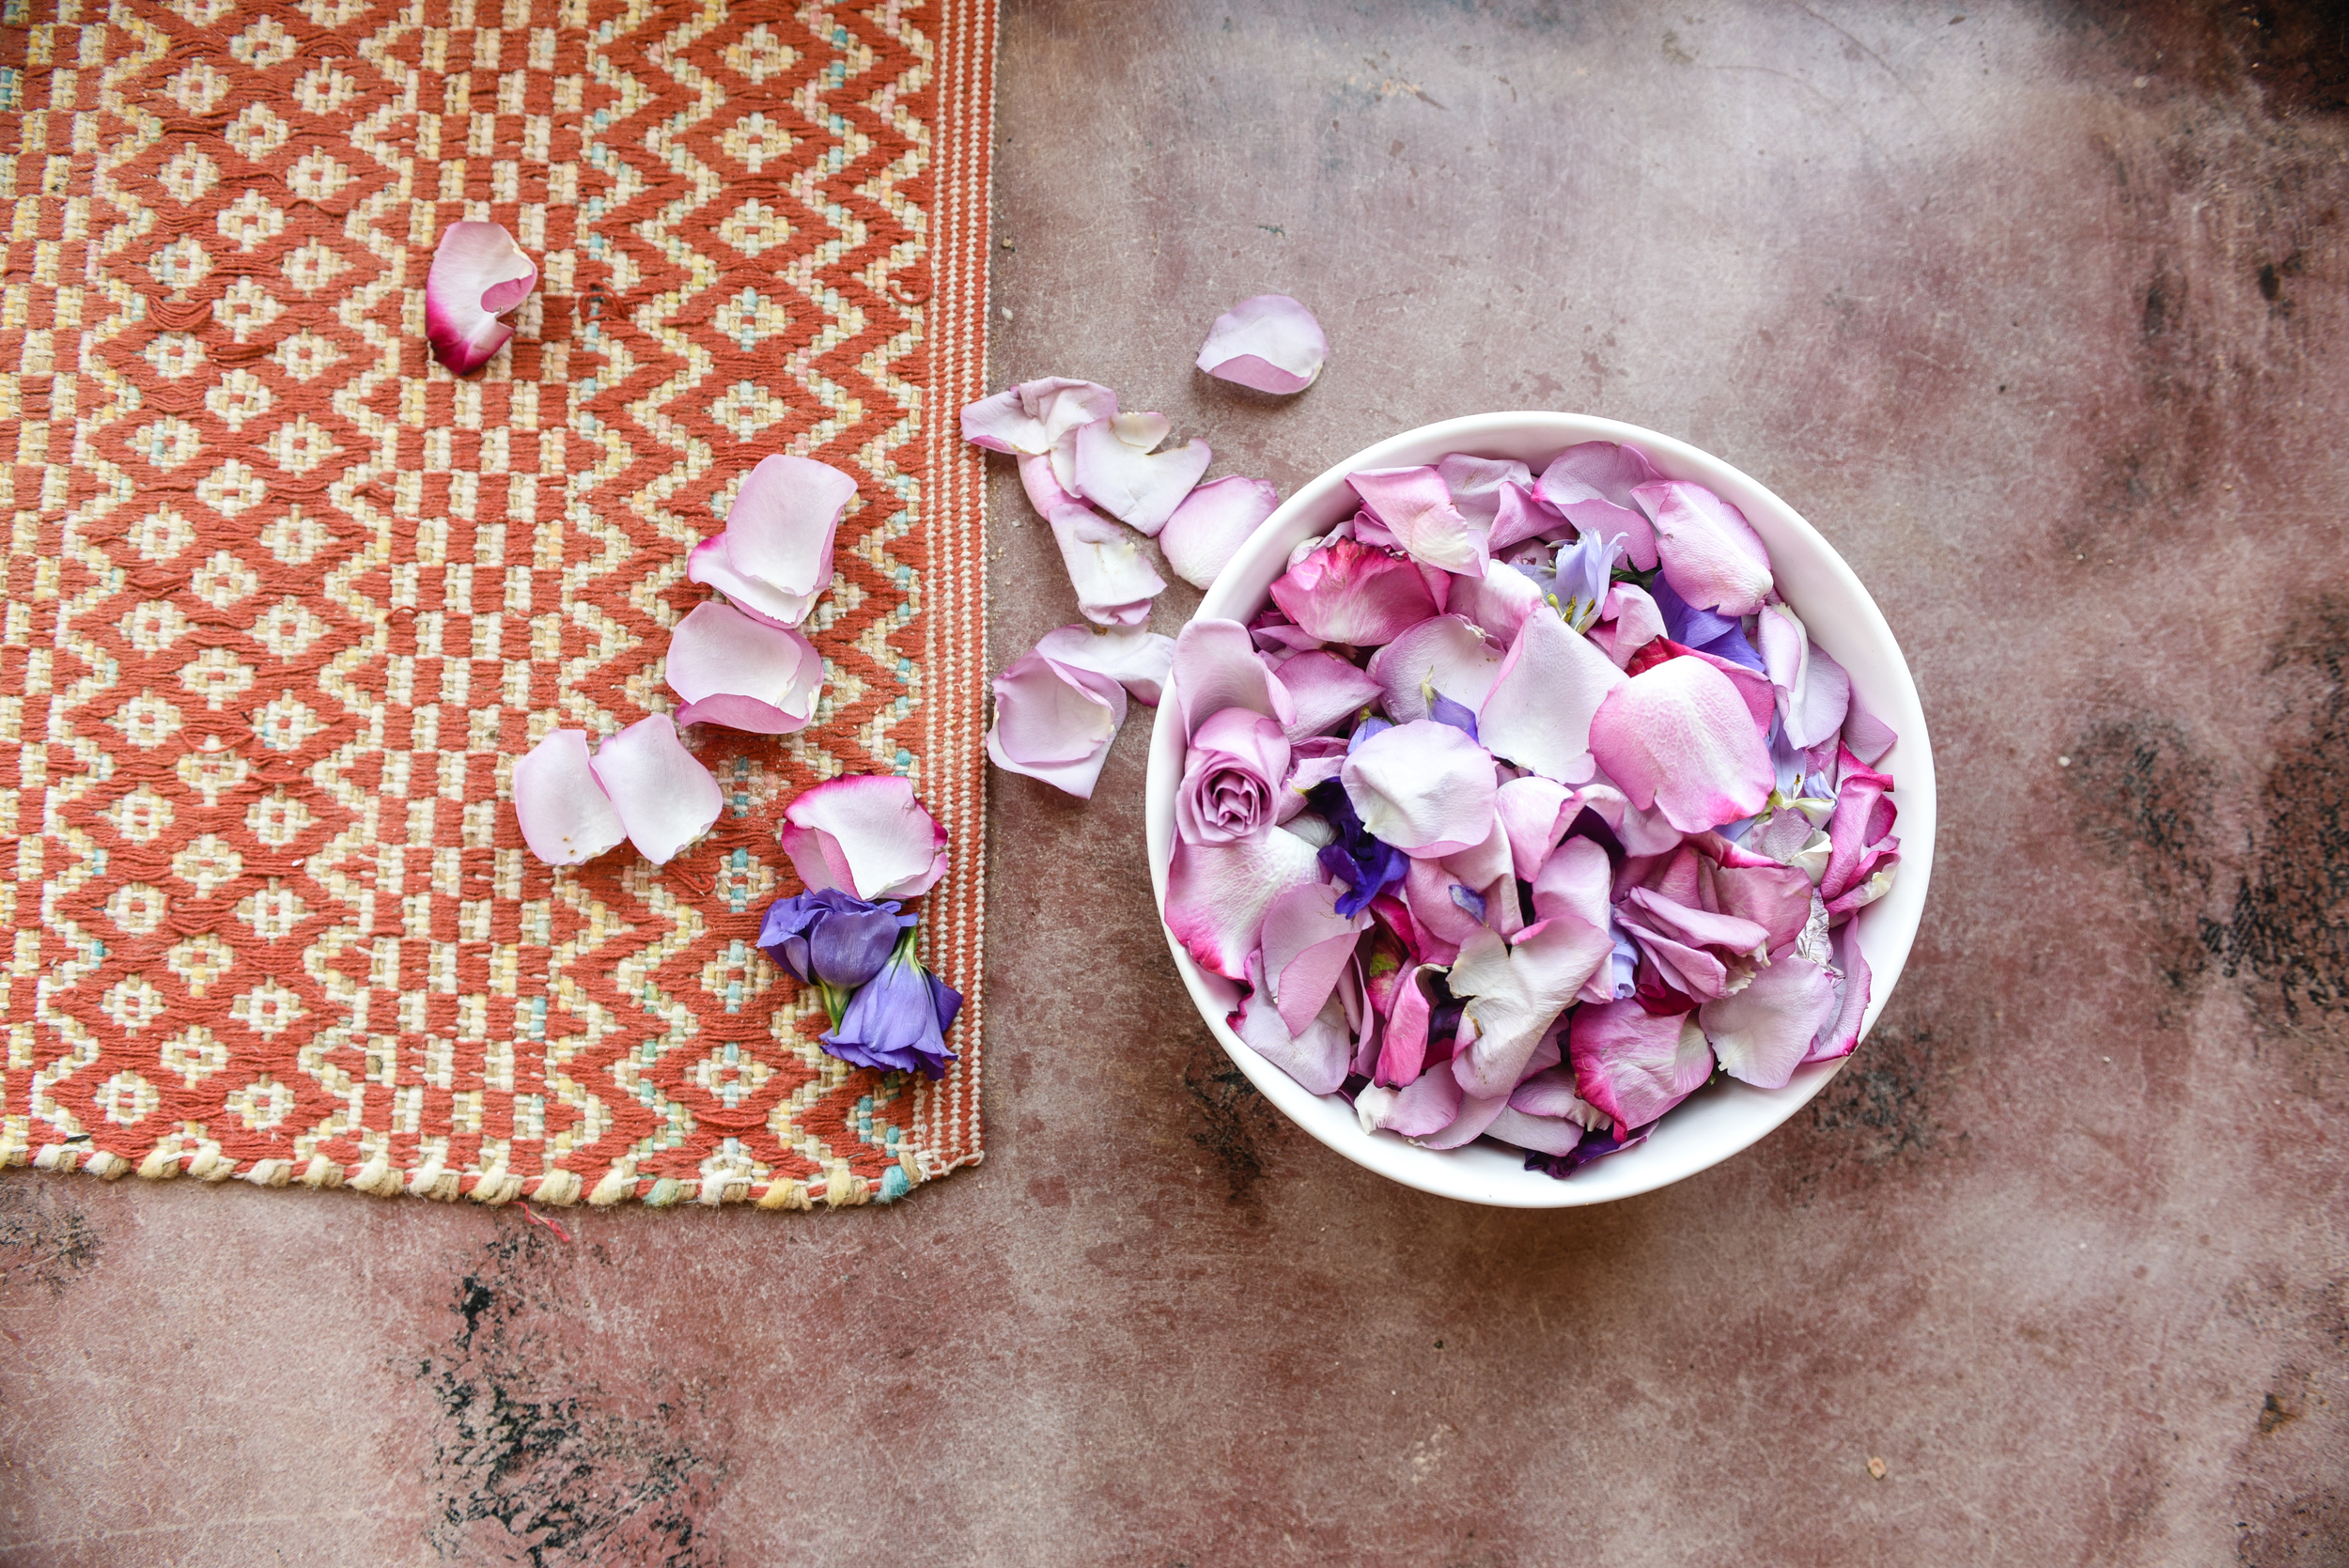 rose petals, minimalistic, minimal rose photo, joshua tree